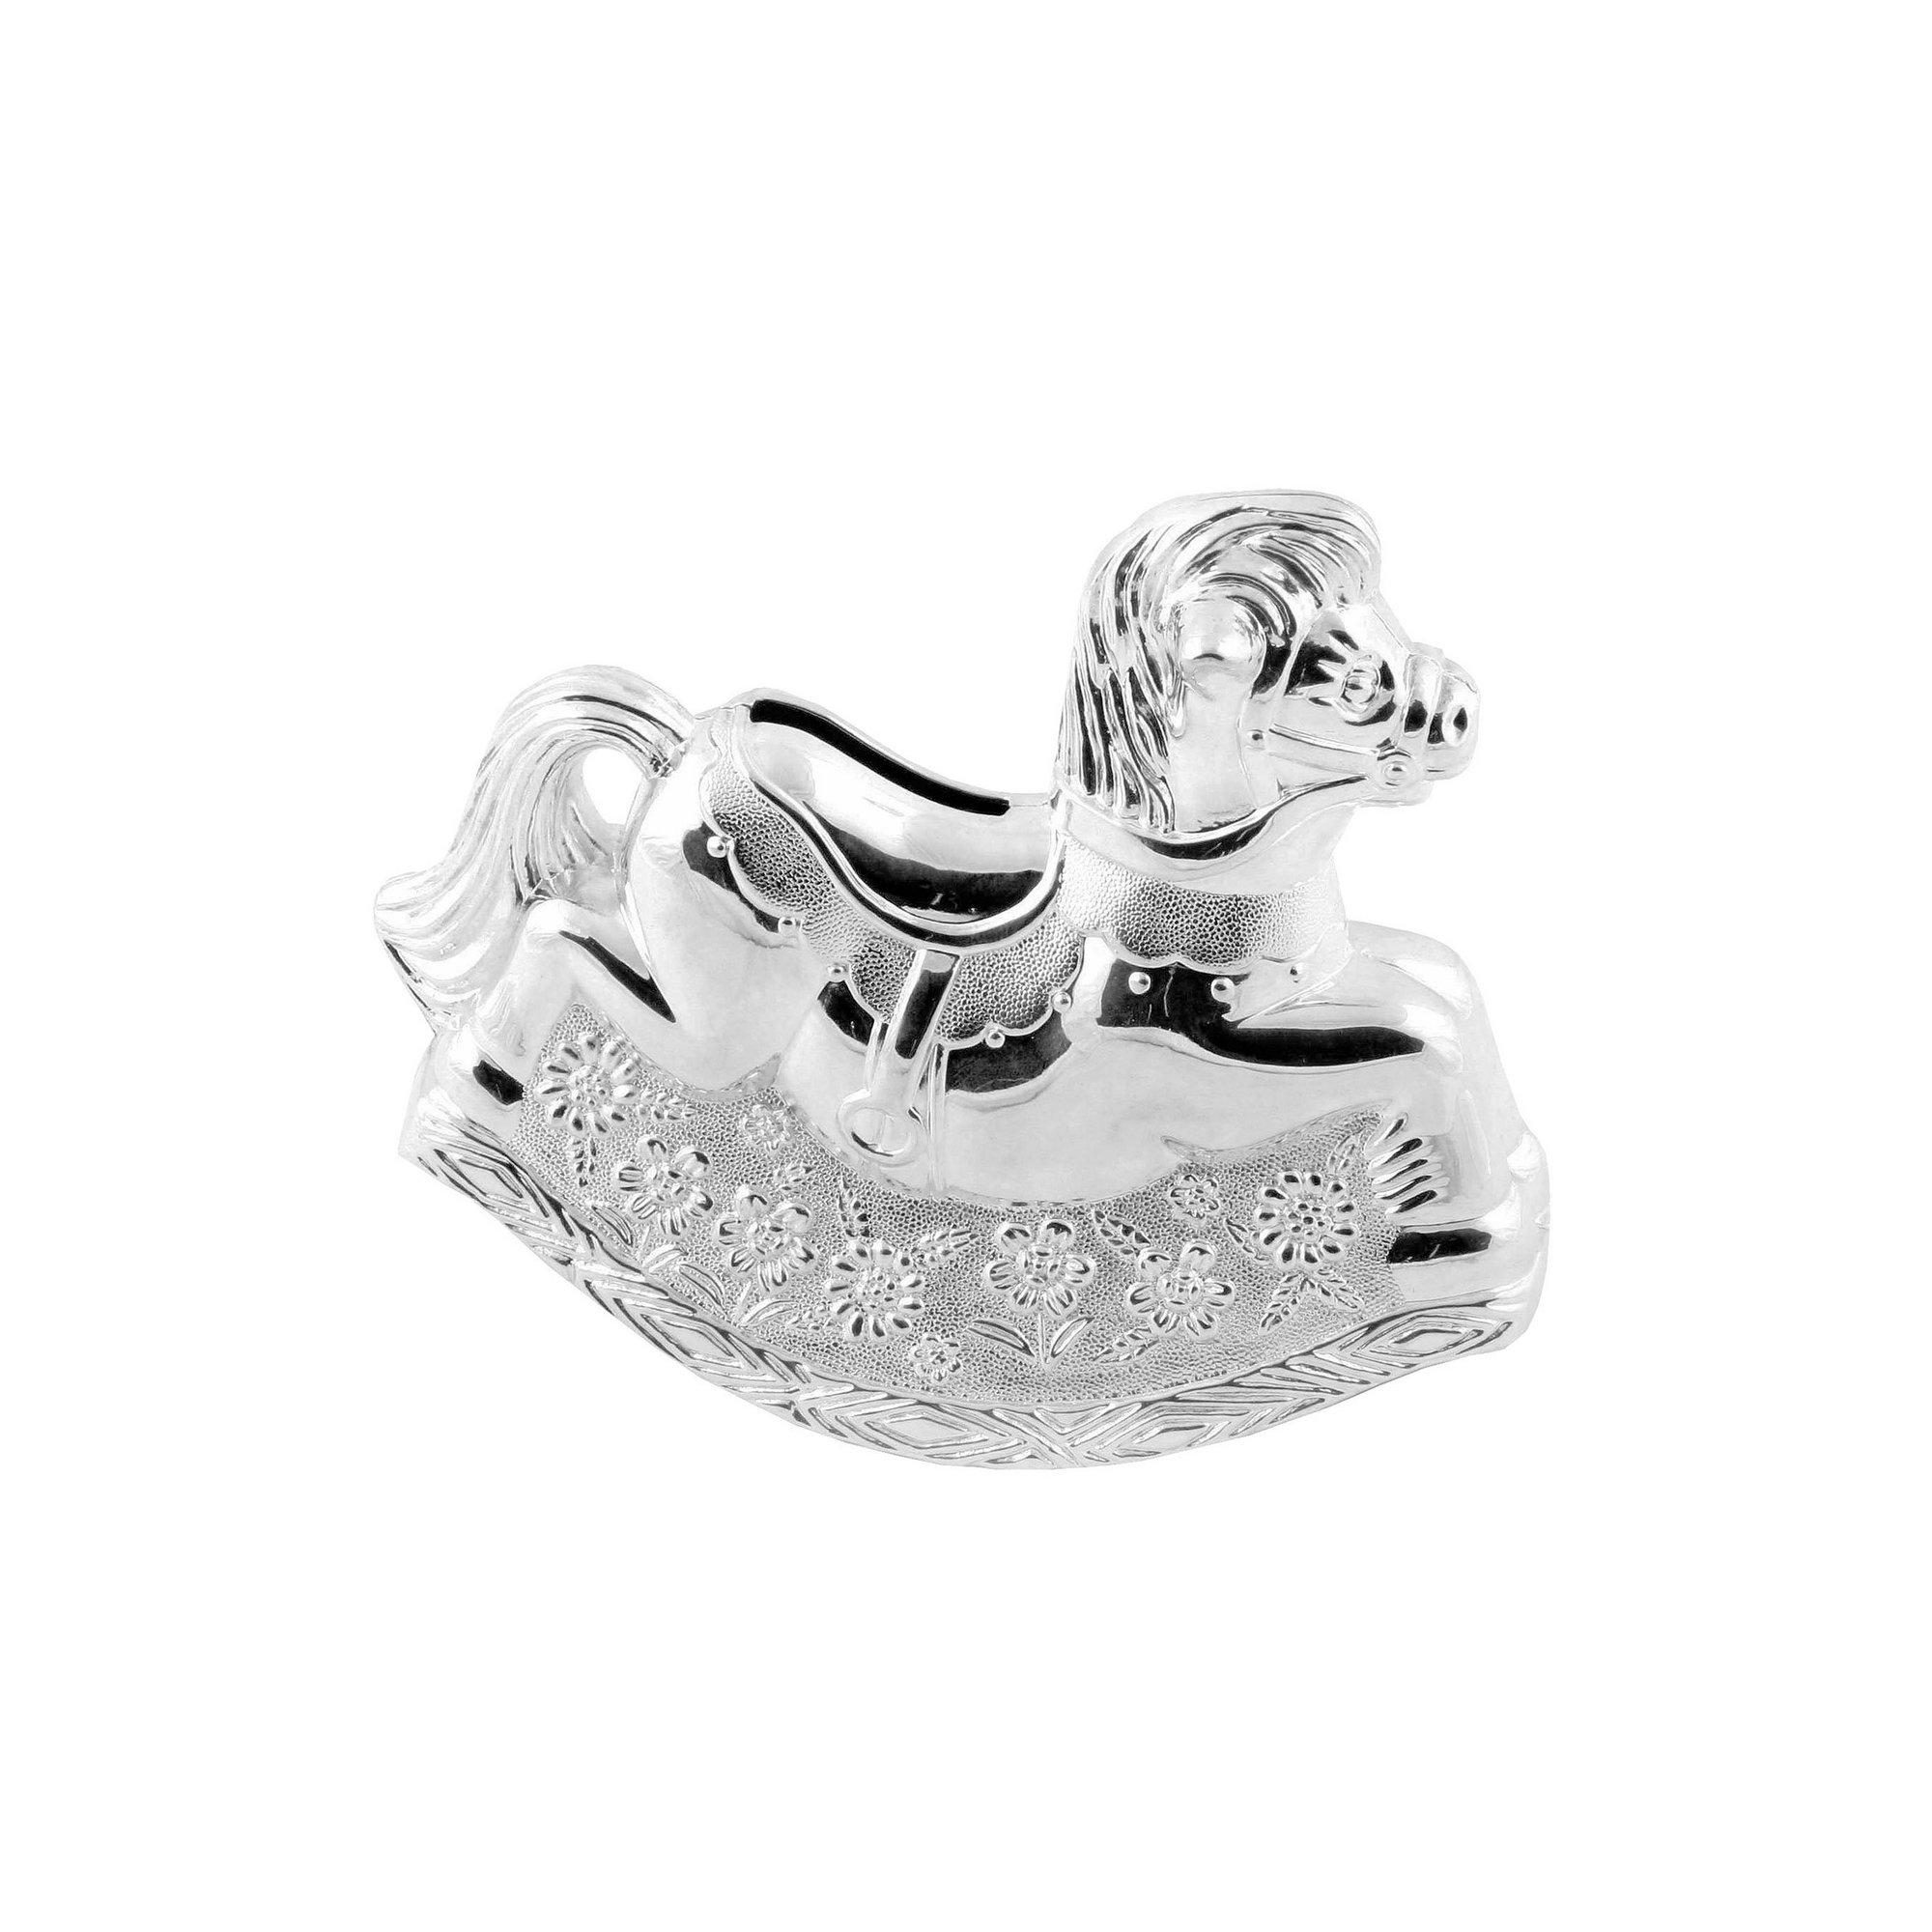 Image of Bambino Silver Plated Rocking Horse Money Box